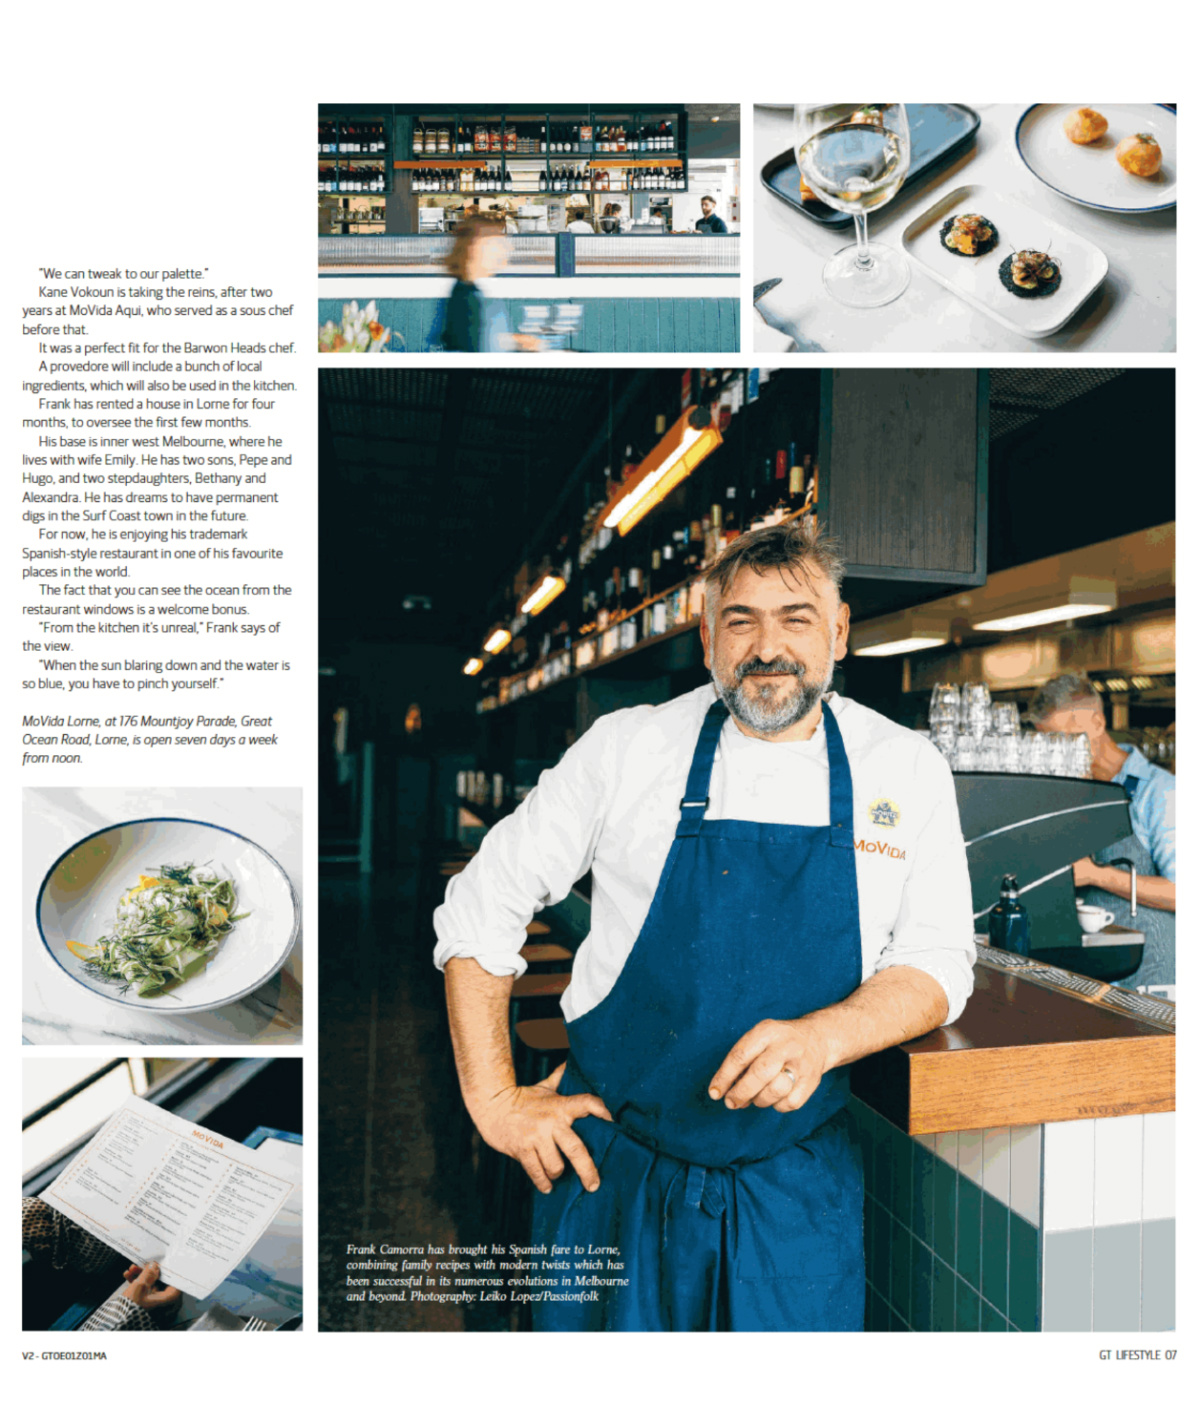 GT Magazine_Movida_Lorne_Passionfolk_2.jpg